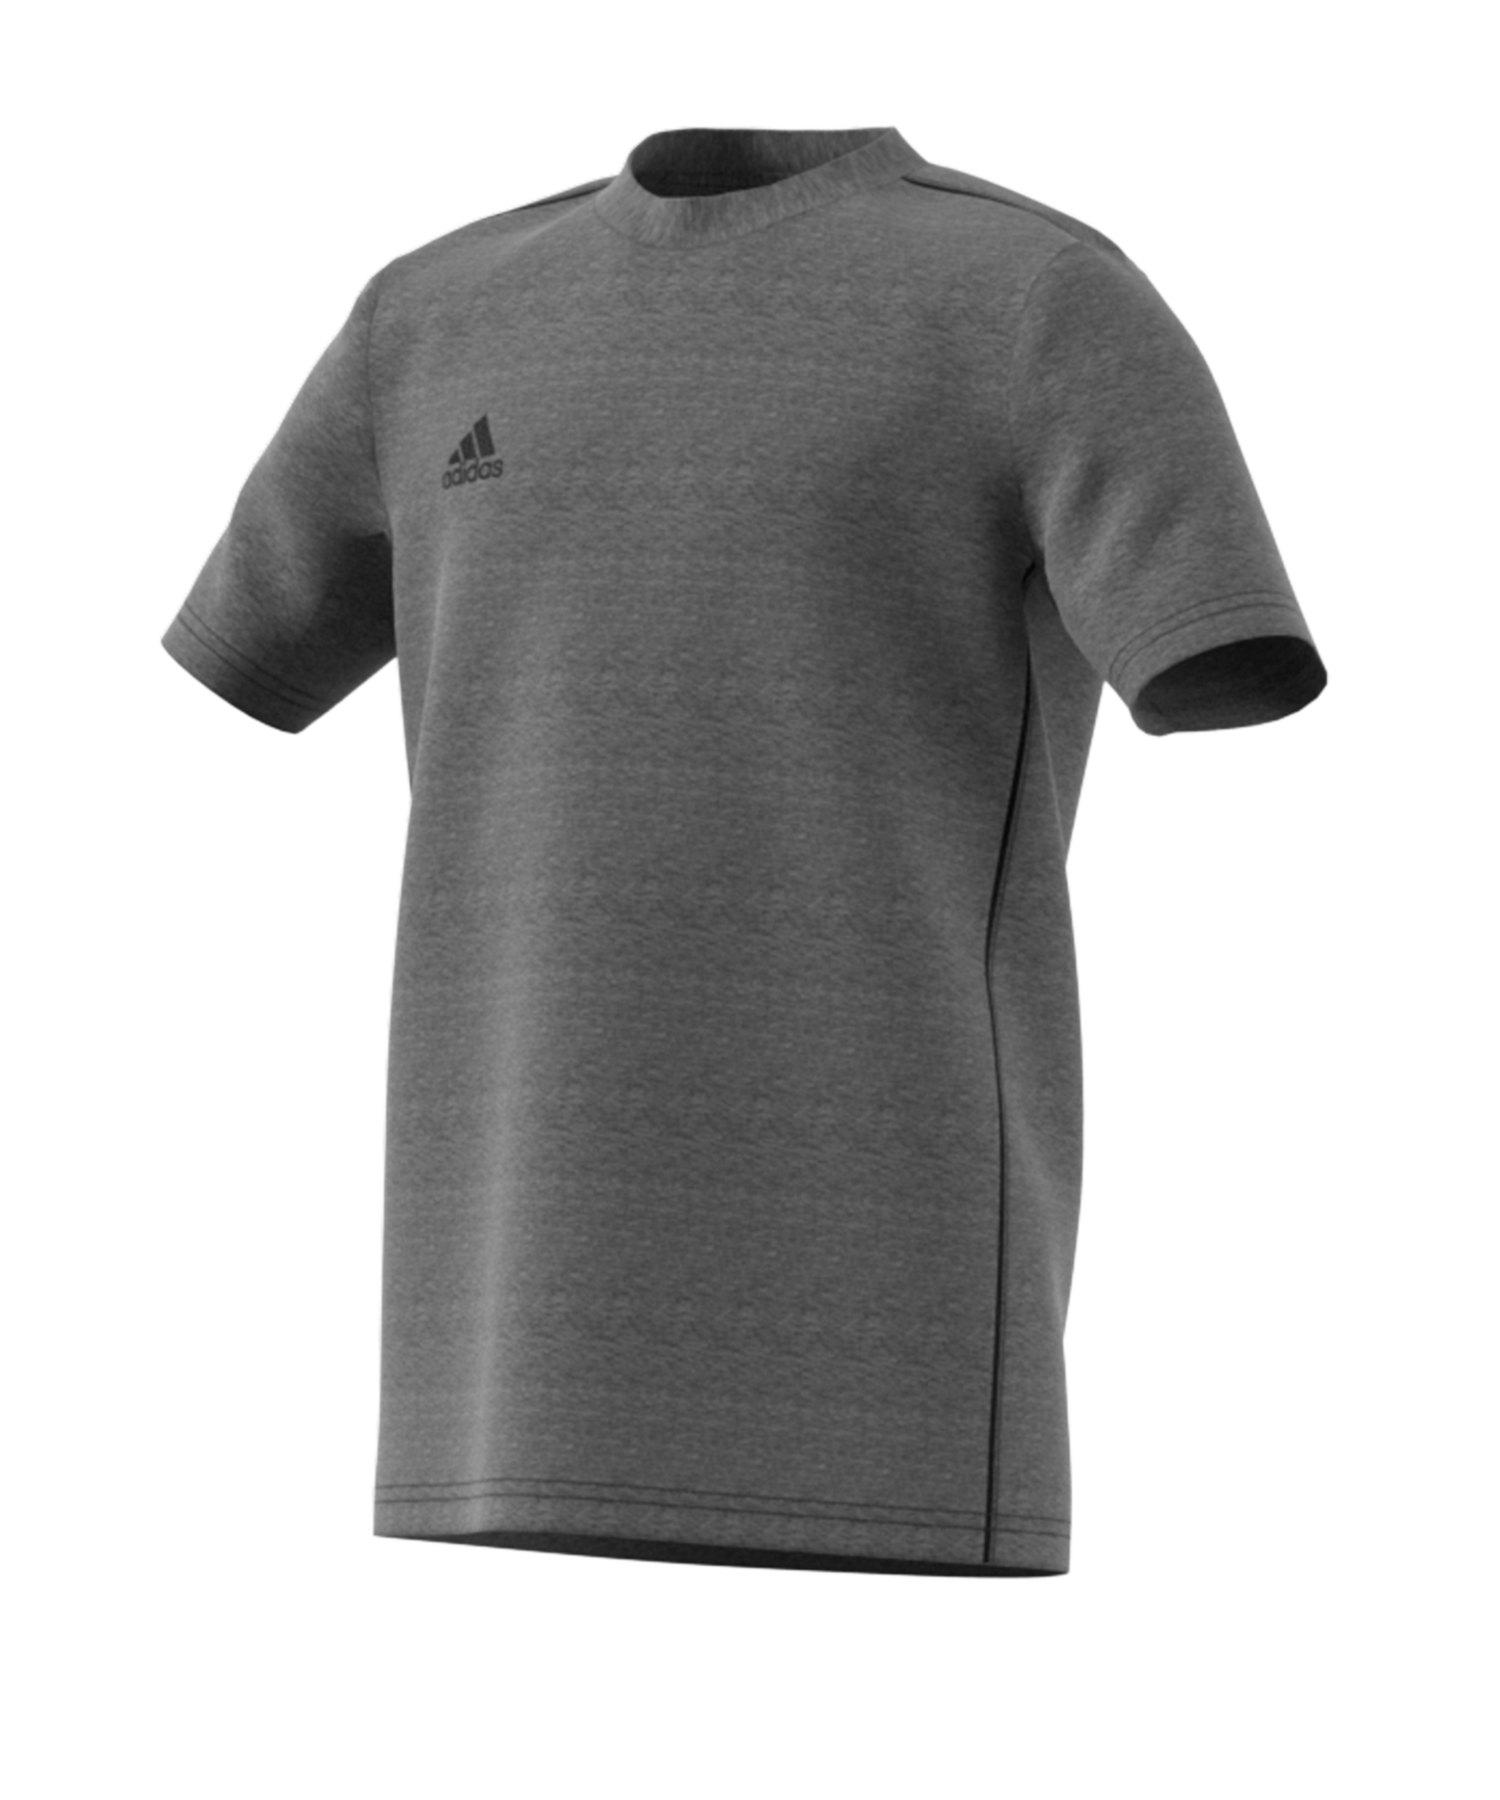 adidas Core 18 Tee T-Shirt Kids Grau Schwarz - grau